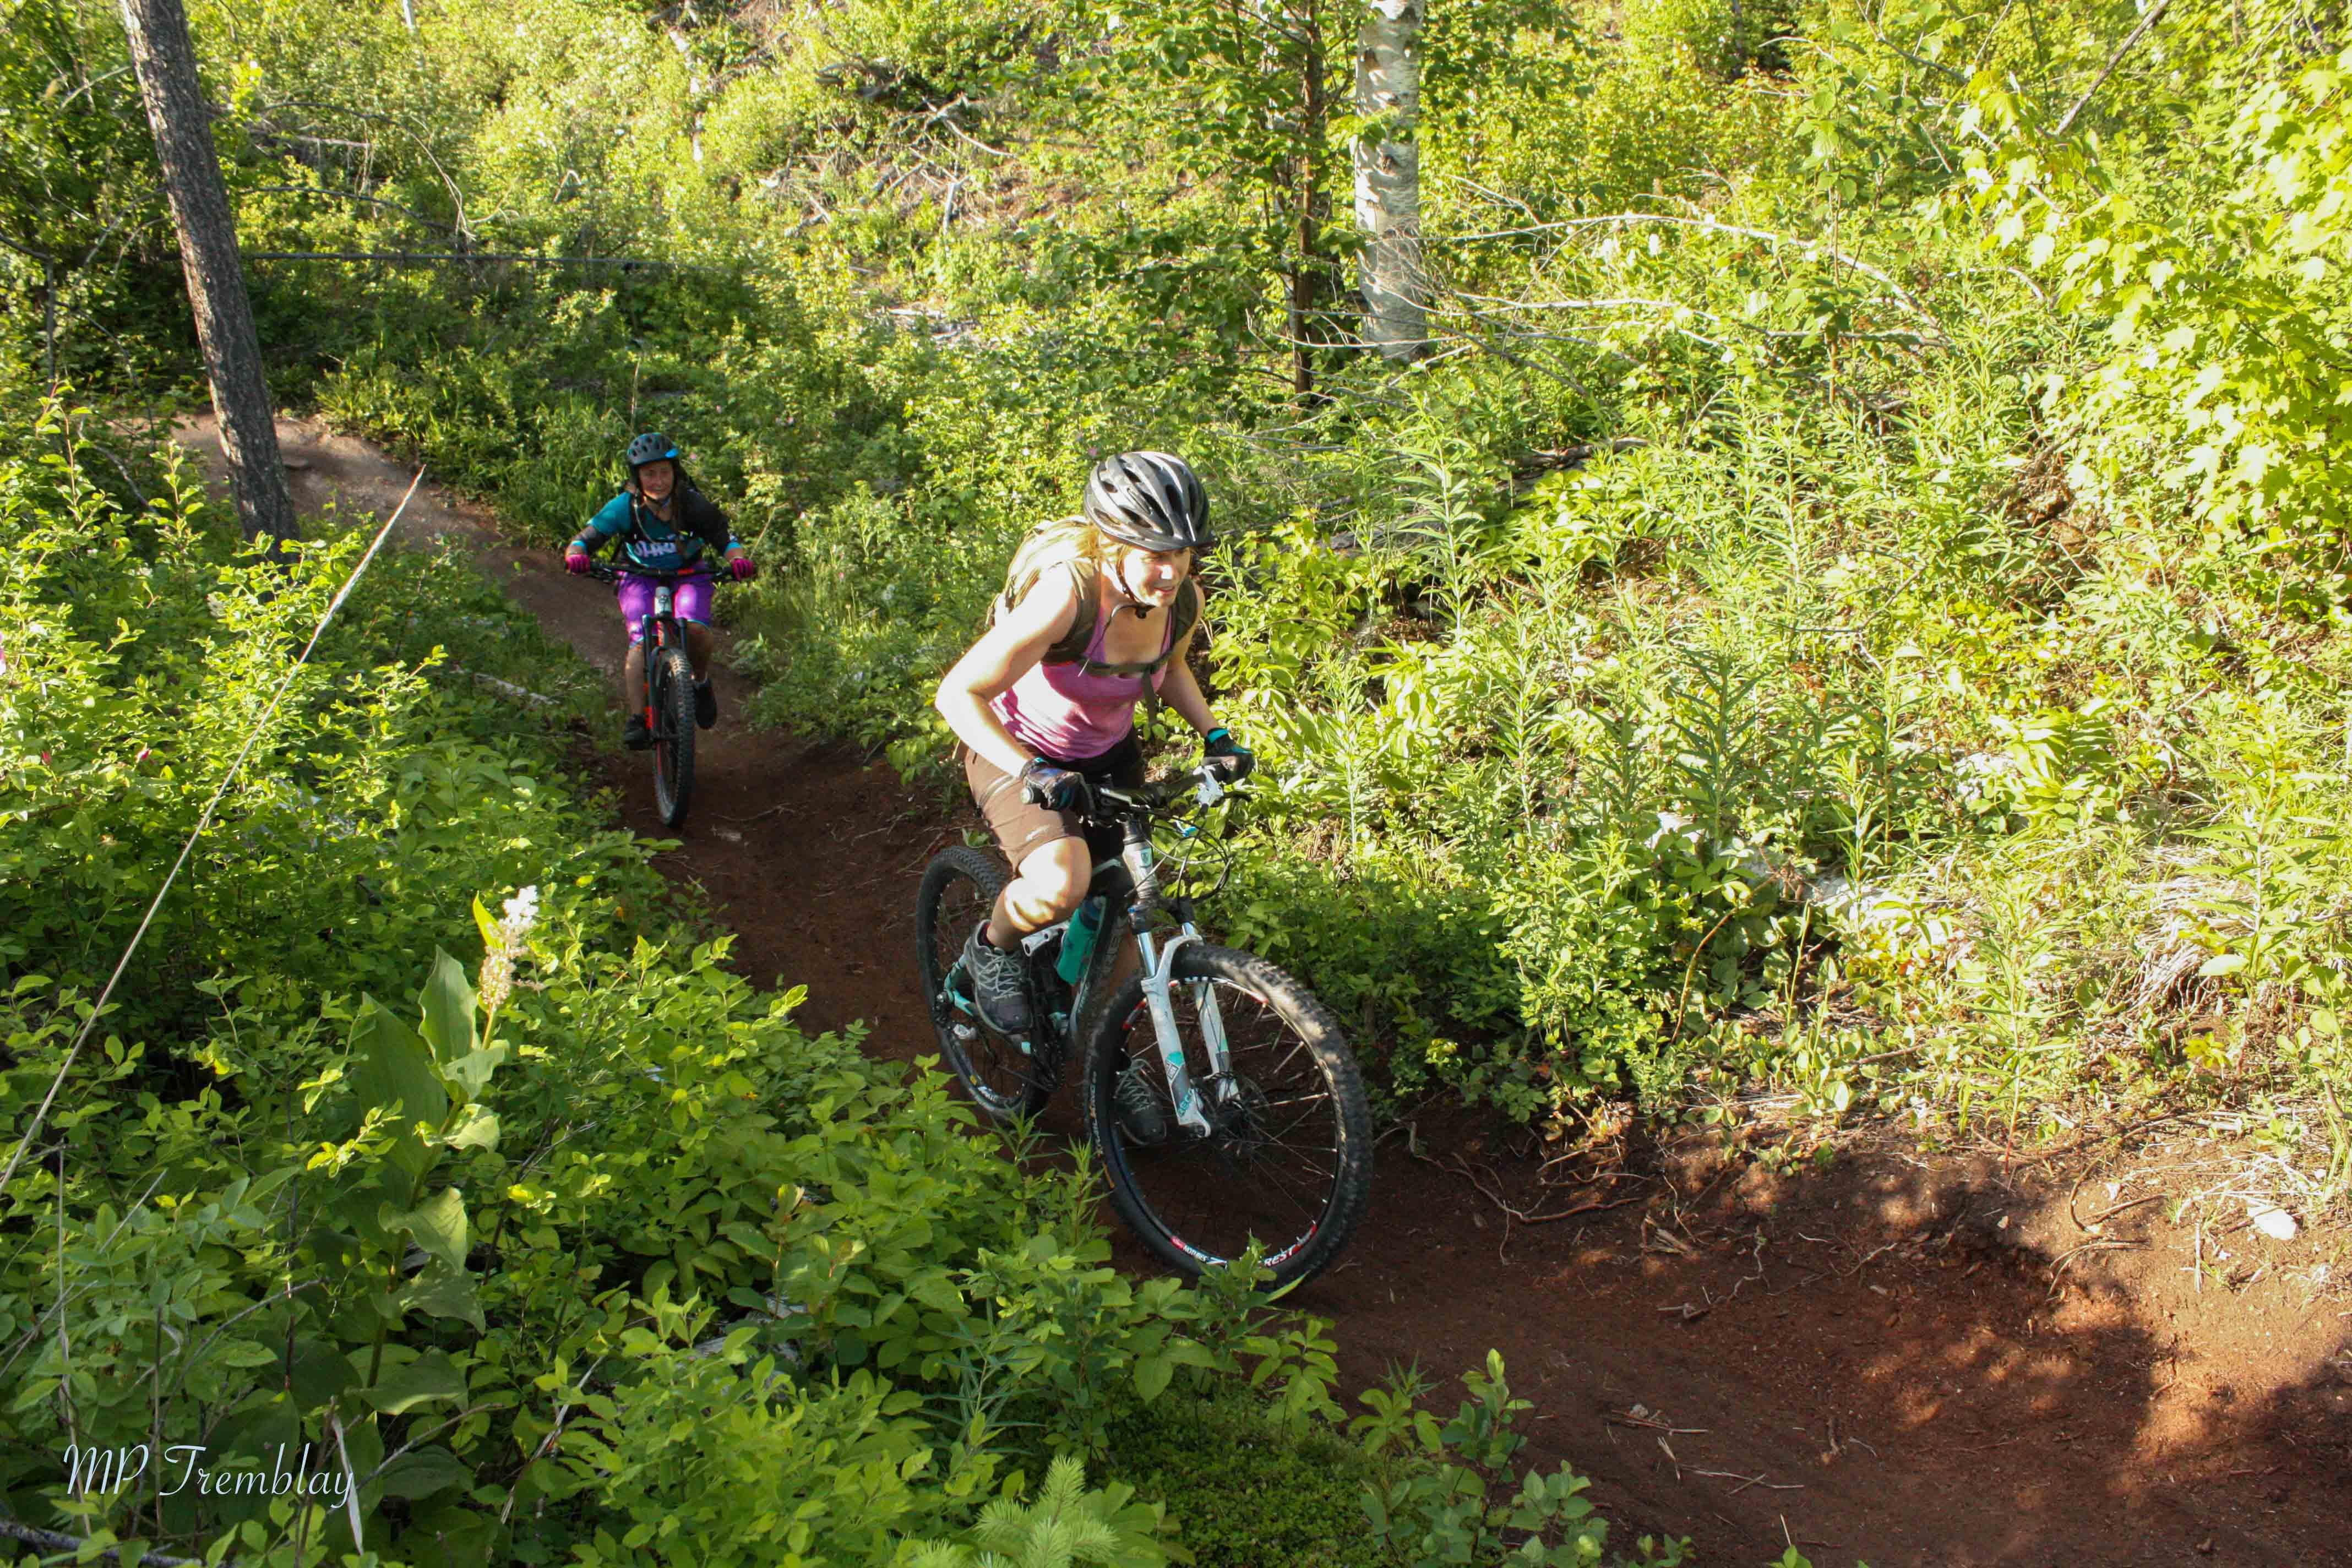 Intermediate Riders: Where to Focus Your Skills